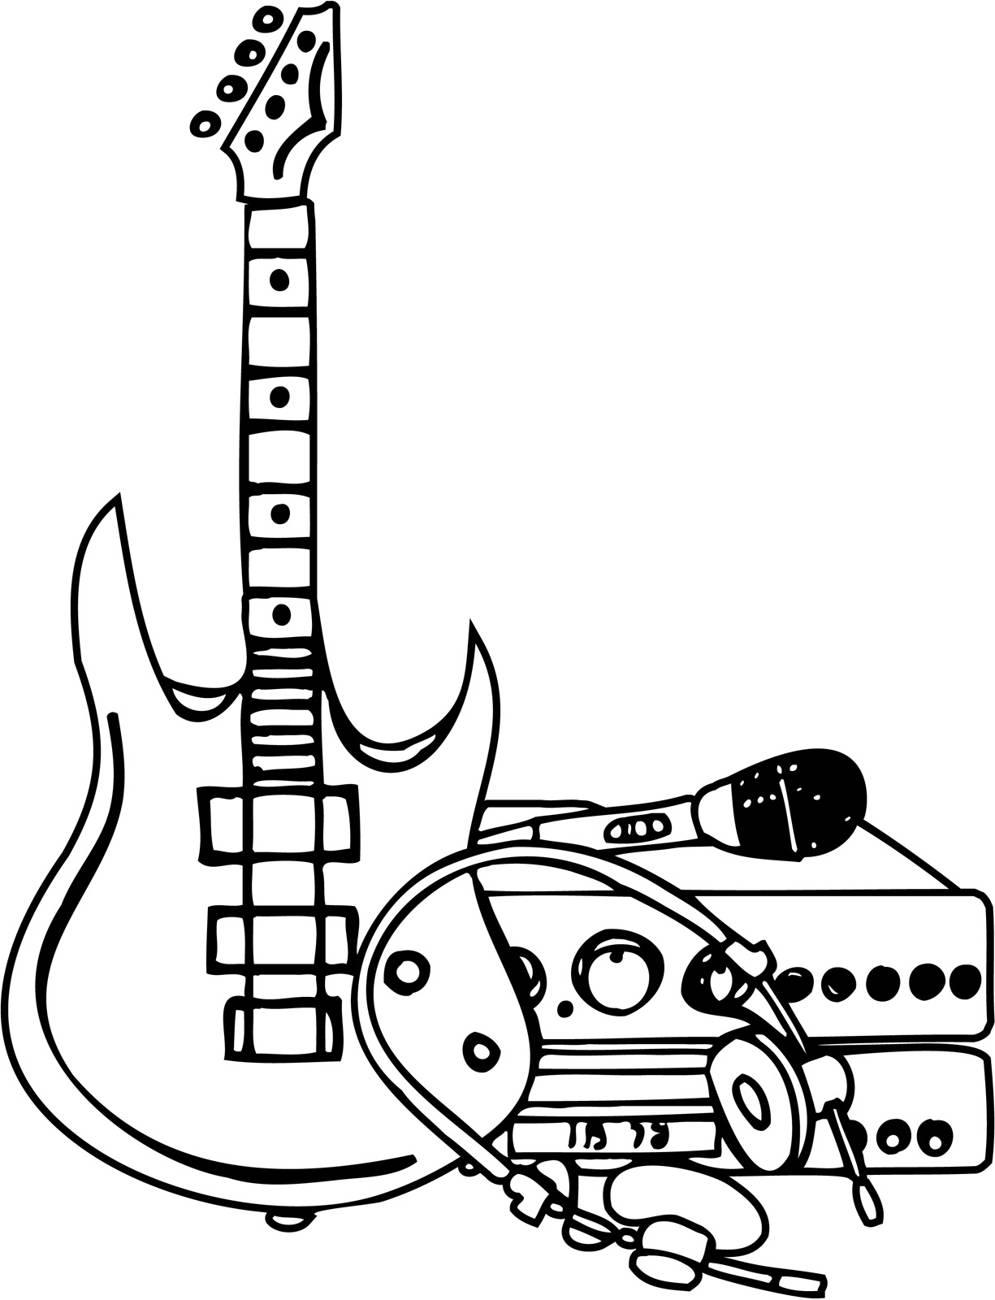 MUSIC-086